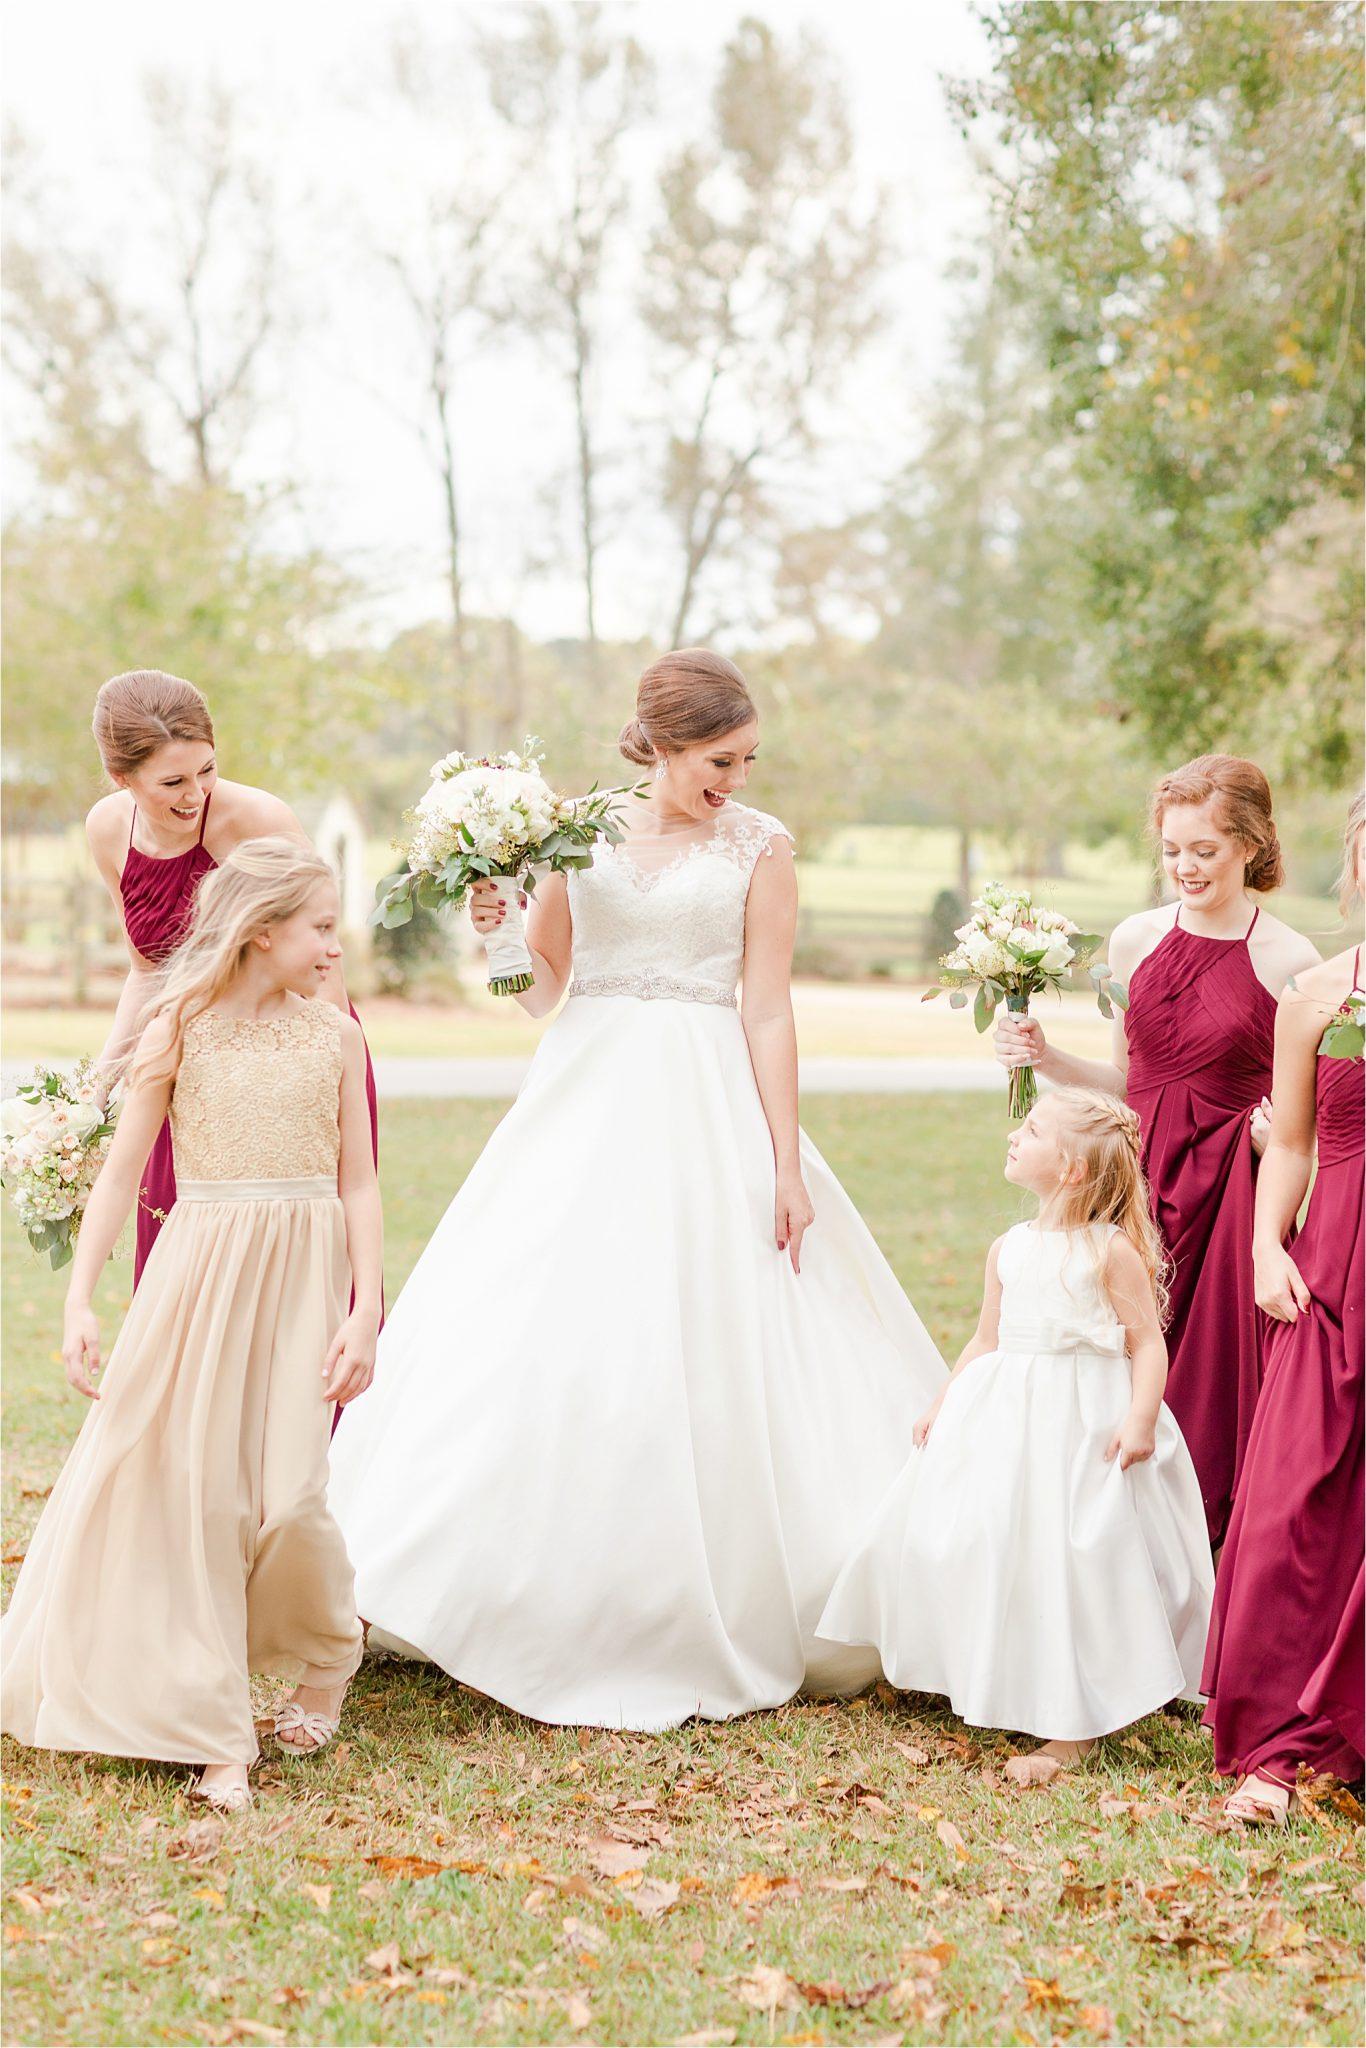 The Barn at Bridlewood Wedding-Hattiesburg, Mississippi-Kelsey + Blake-Wedding details-Barn wedding-Ruby wedding-Autumn themed wedding-Wedding dress-Bridal party-Bridemaids